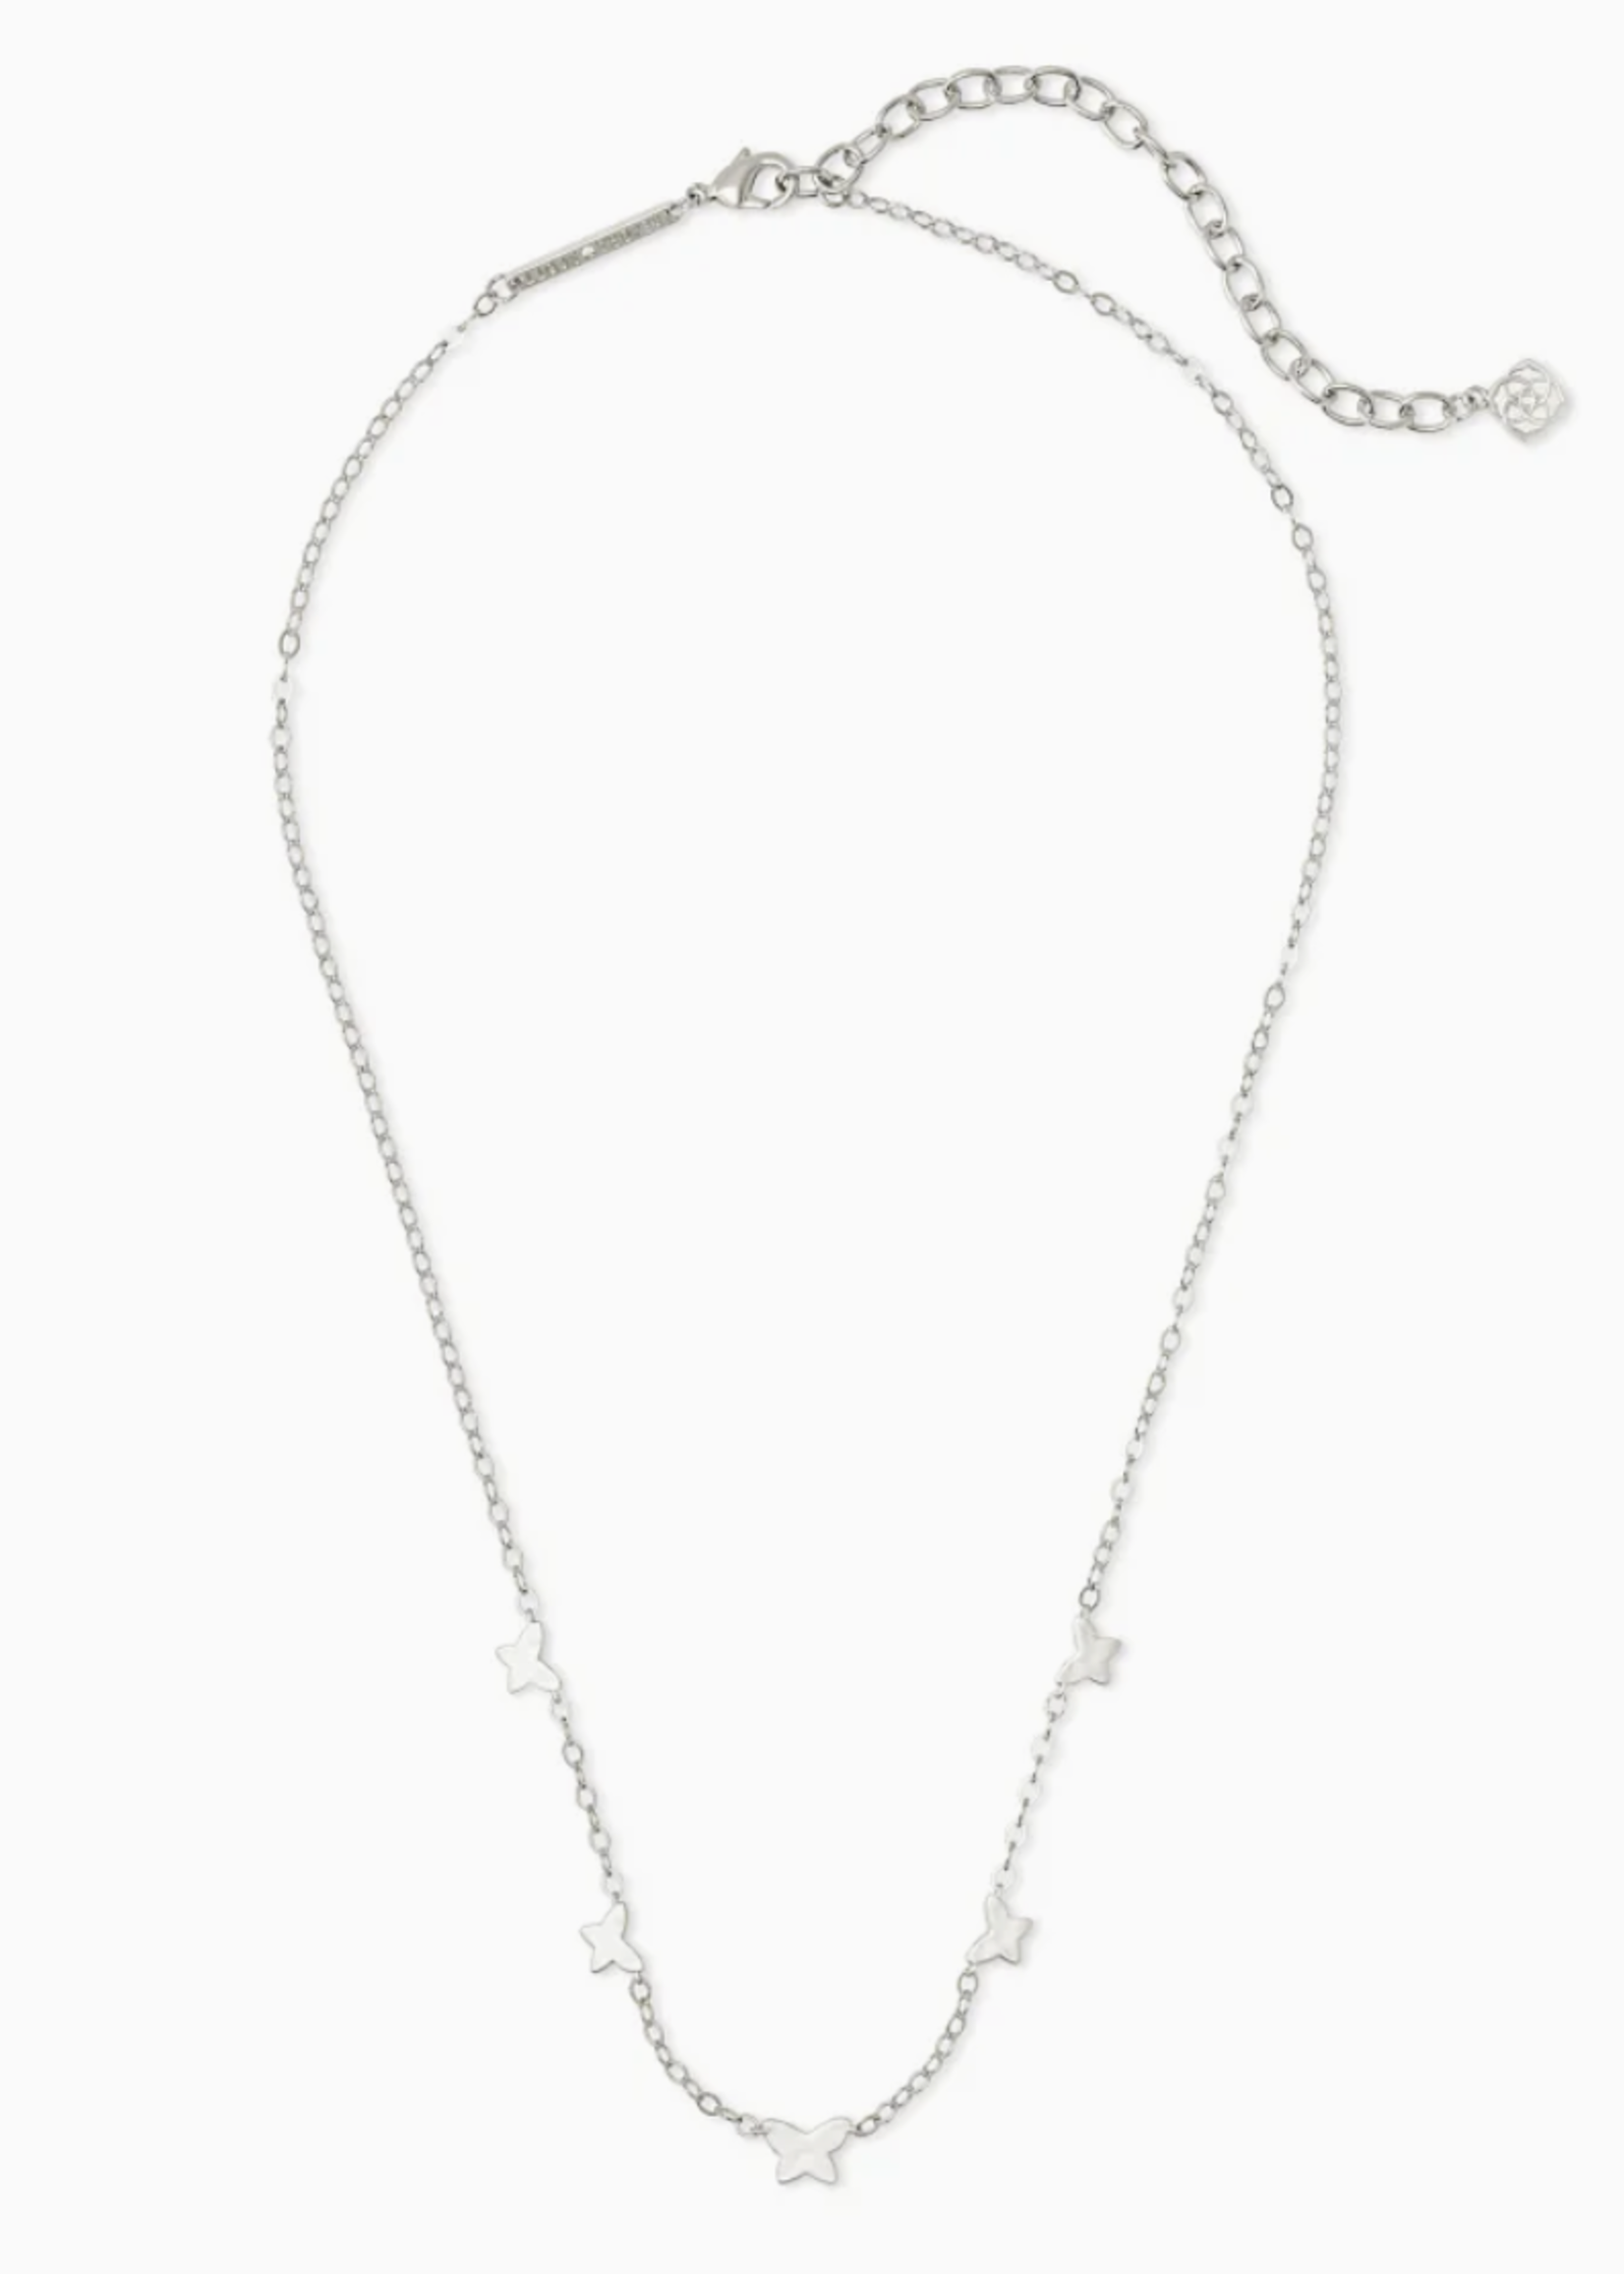 Kendra Scott Kendra Scott Lillian Butterfly Strand Necklace Silver